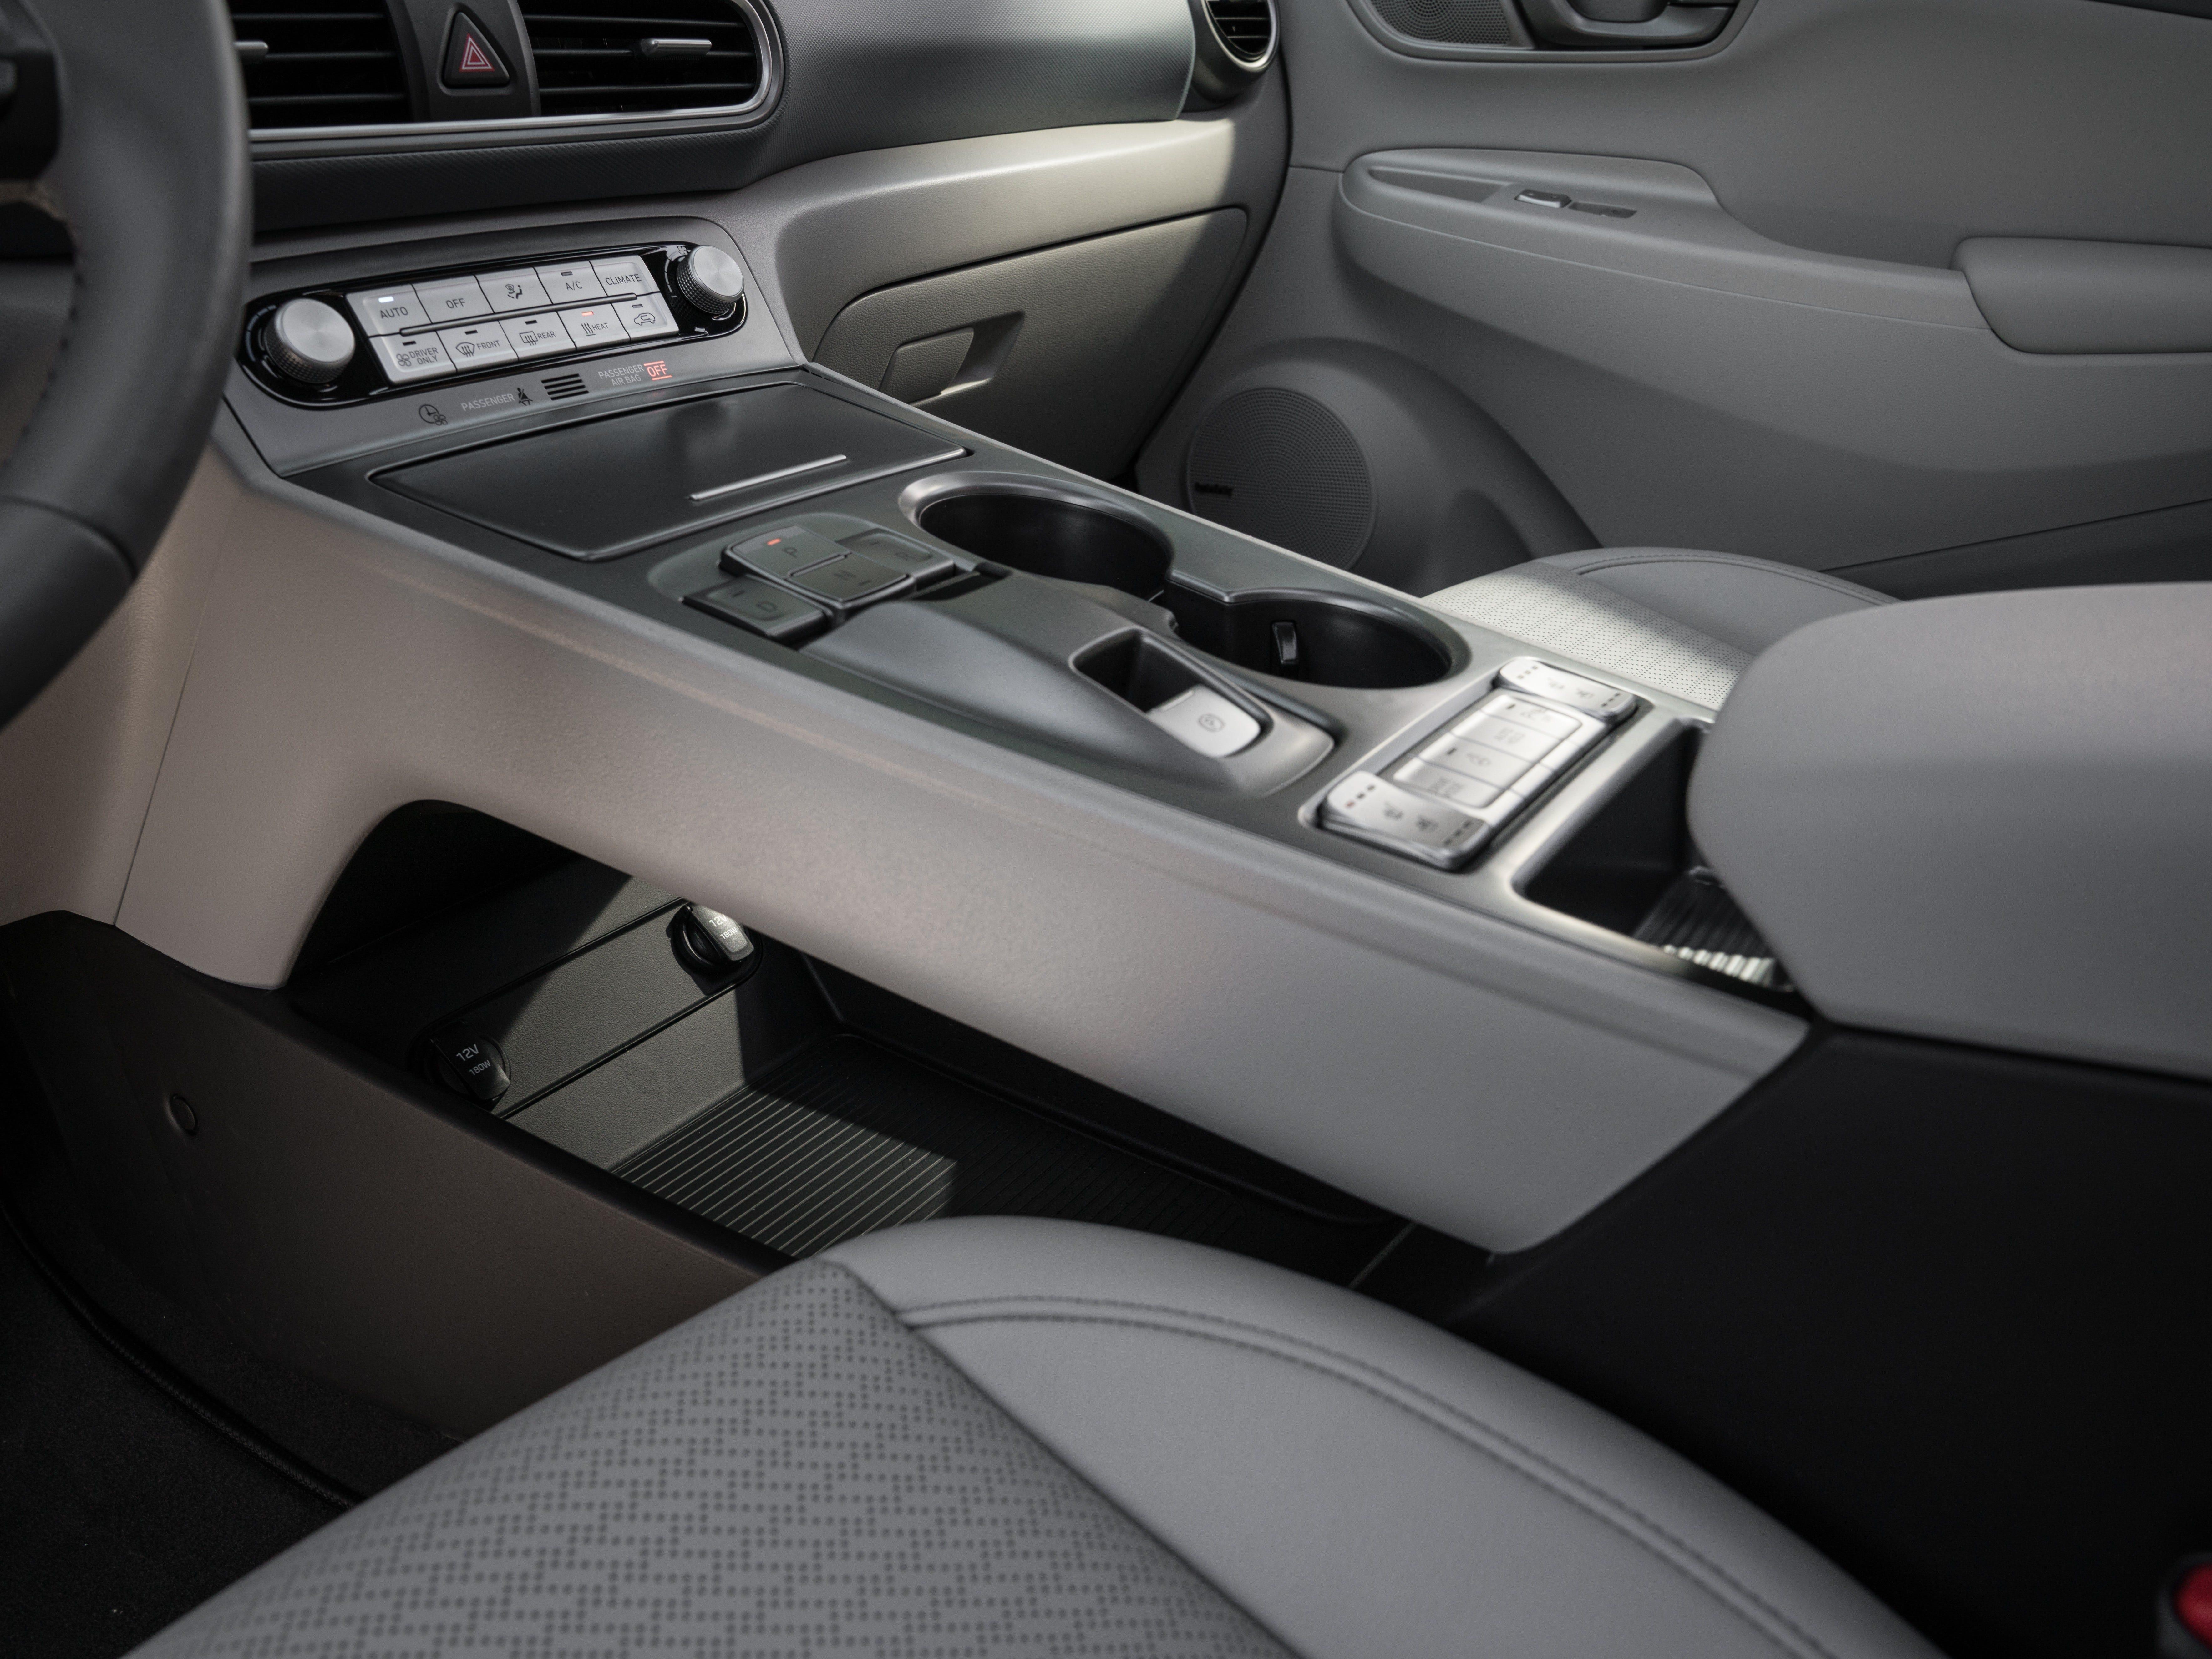 The Hyundai Kona electric car comes with storage space under a center console bridge.